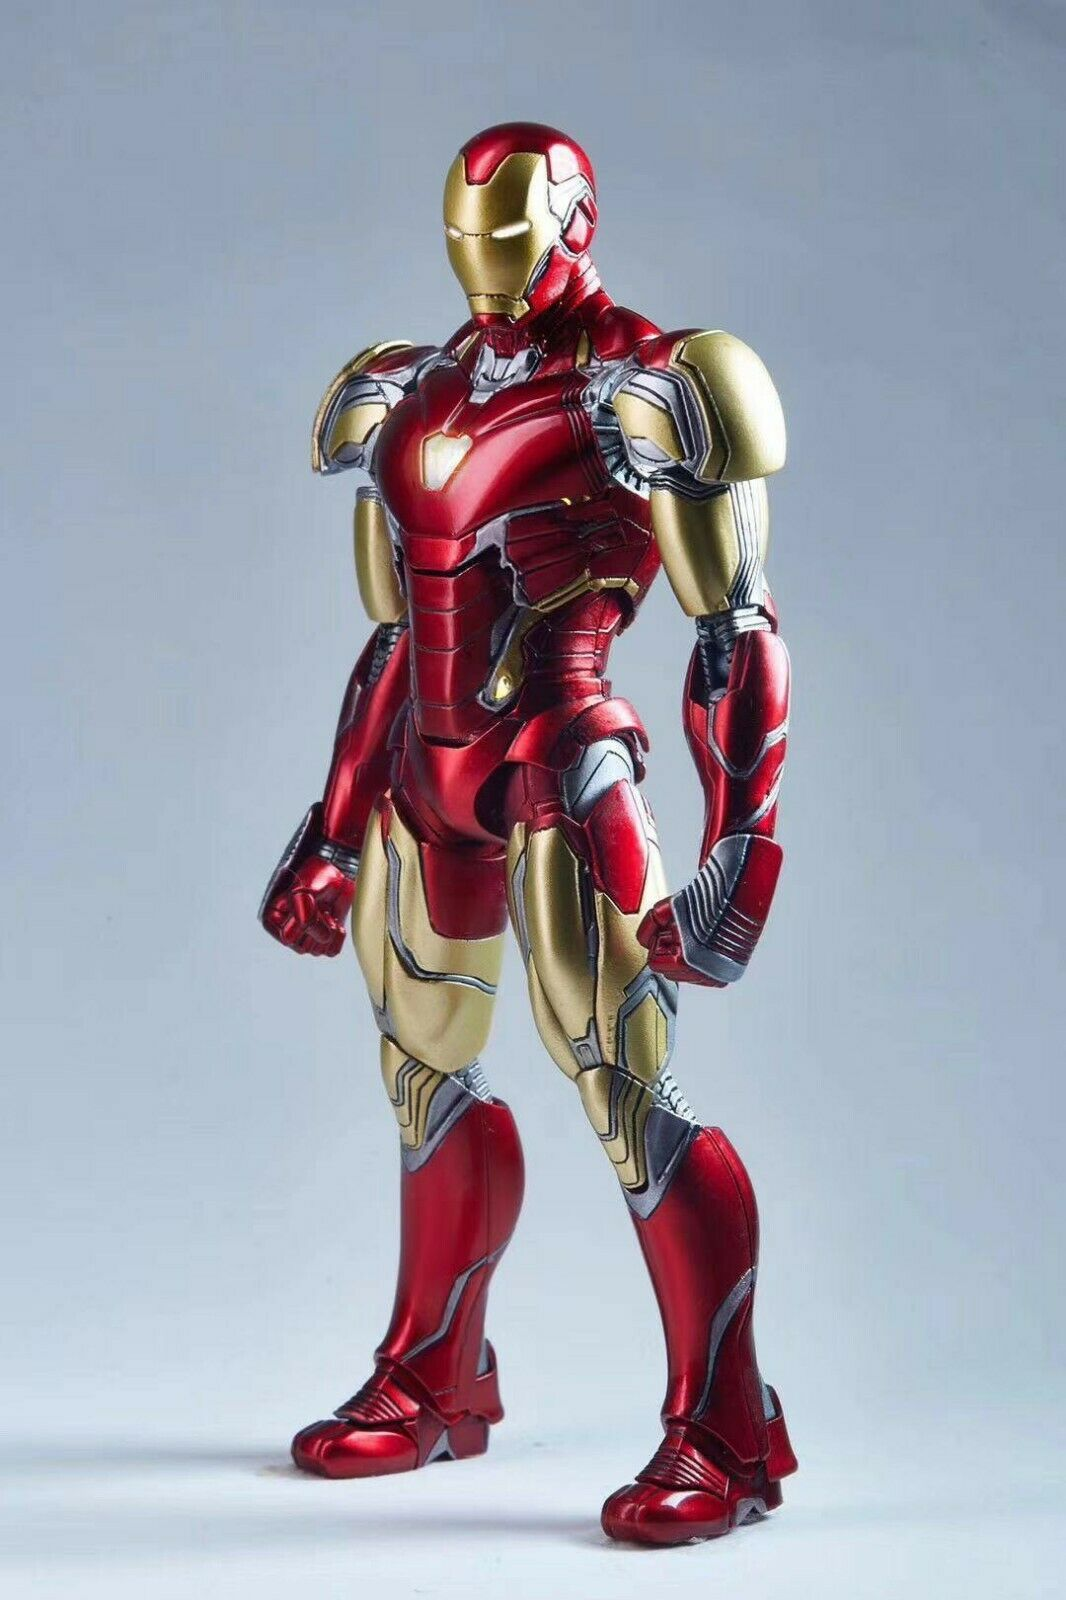 Comicave Studios 1/12 Iron Man MK85 Mark LXXXV Diecast Alloy Figure Collectible on eBay thumbnail